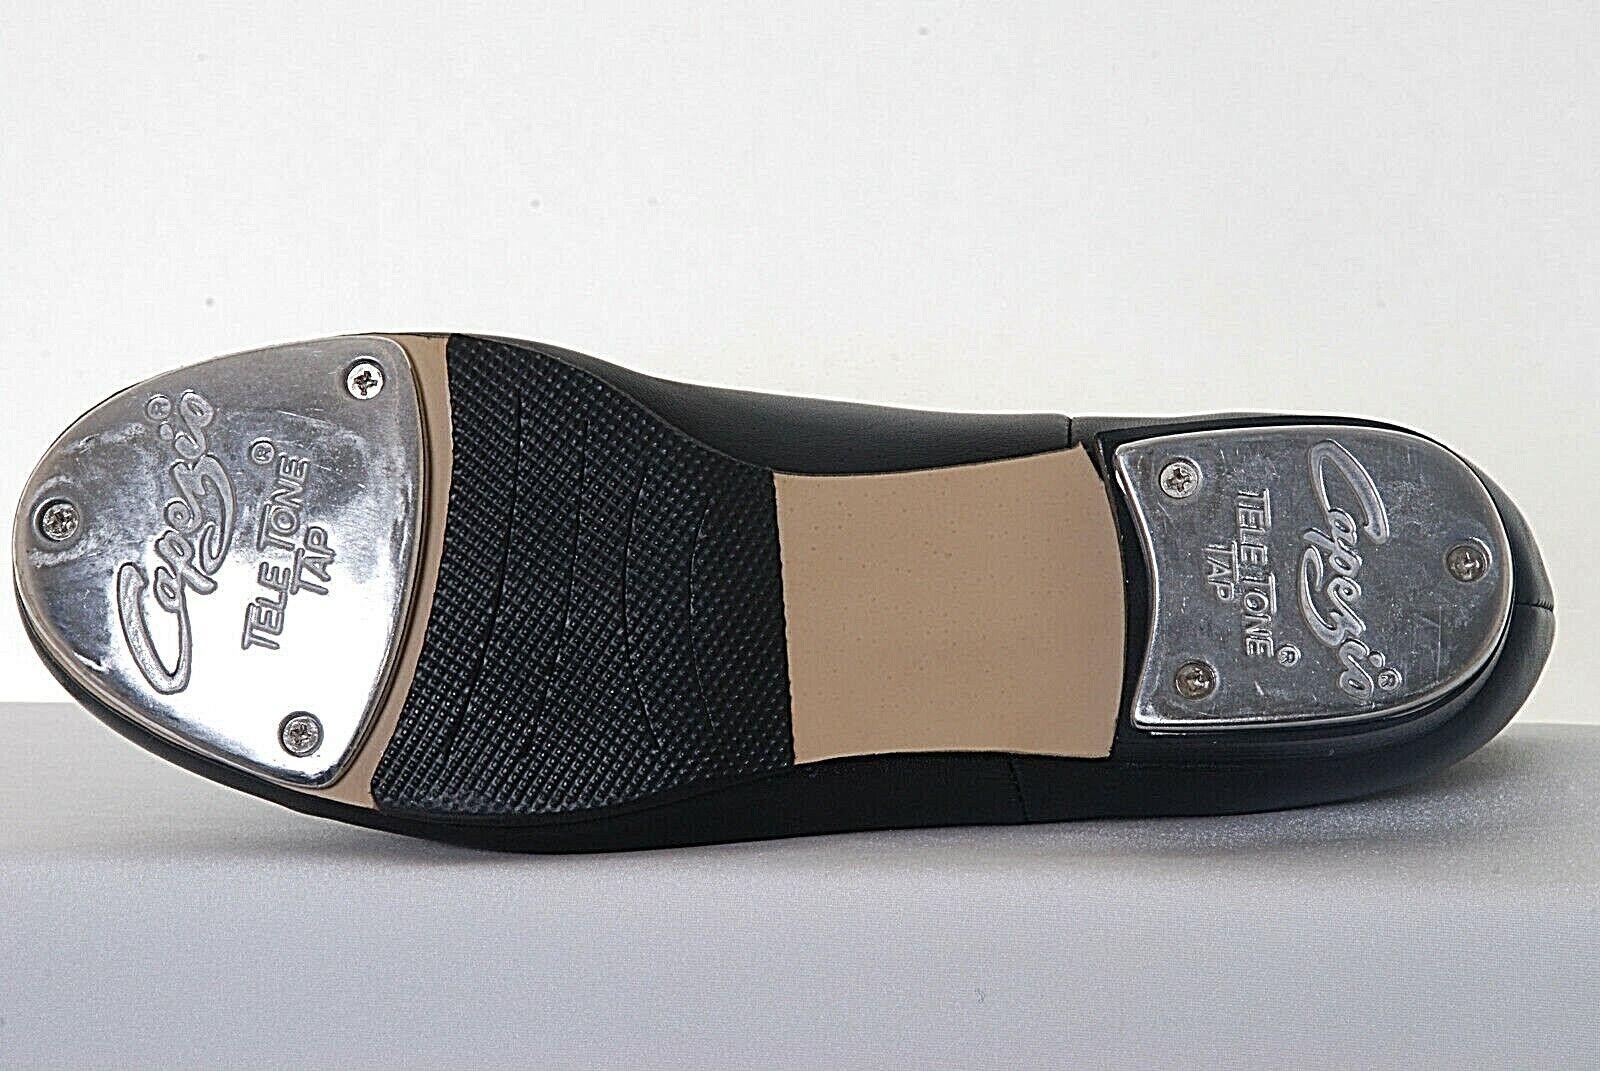 Capezio Cg55 Cg55 Cg55 Xtreme Leder Niedriger Absatz Oxford Tap Schuhe- Teletone c6bfa3